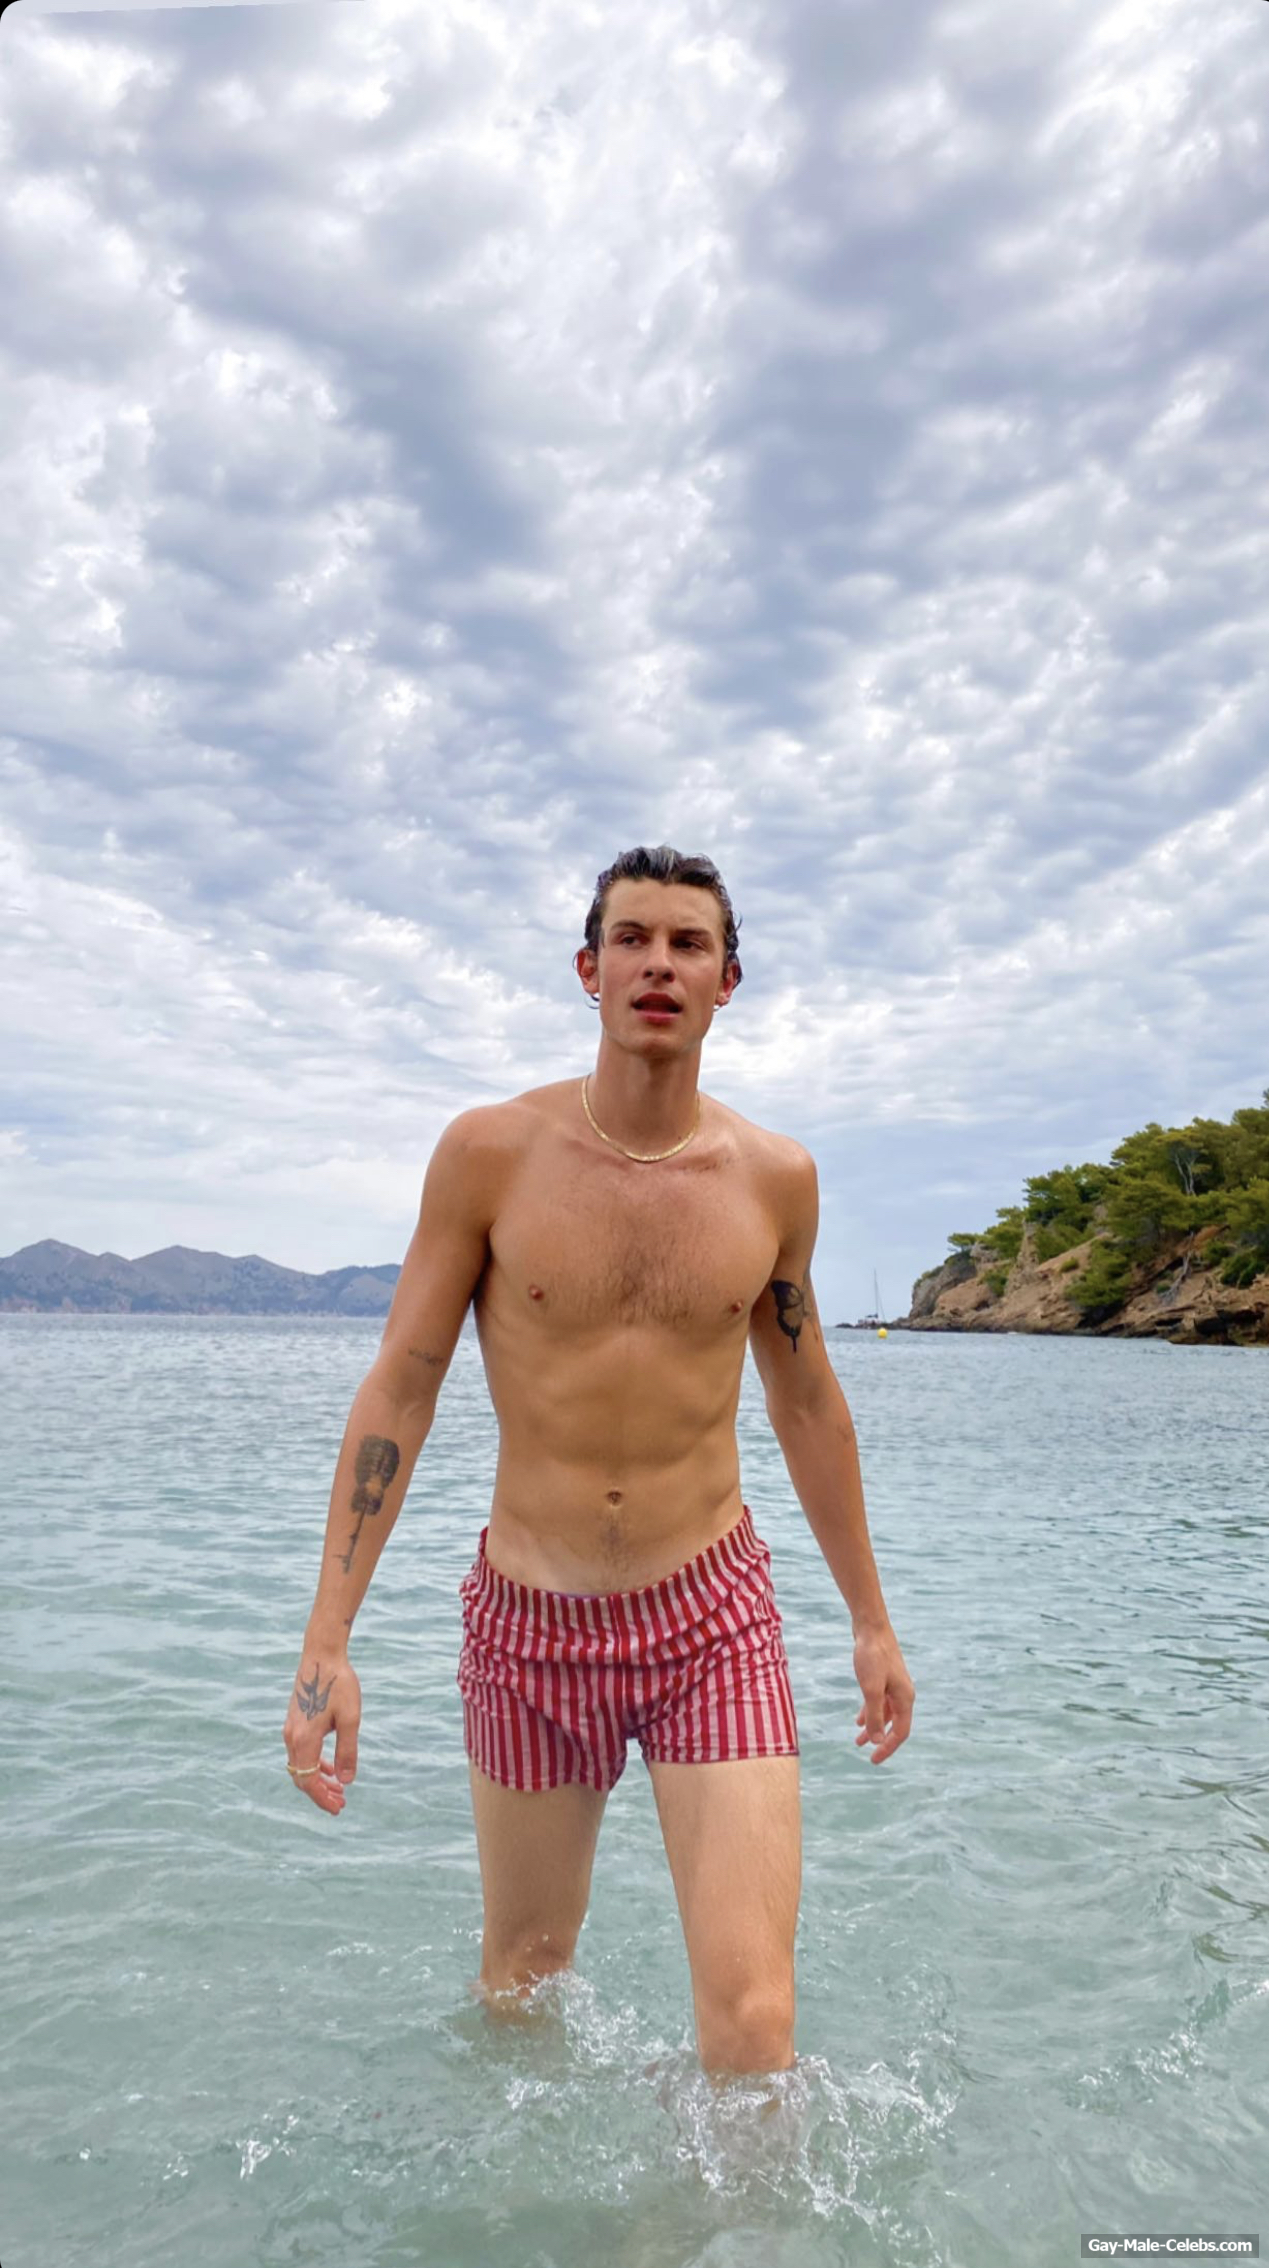 Shawn Mendes Bulge And Shirtless Beach Photos